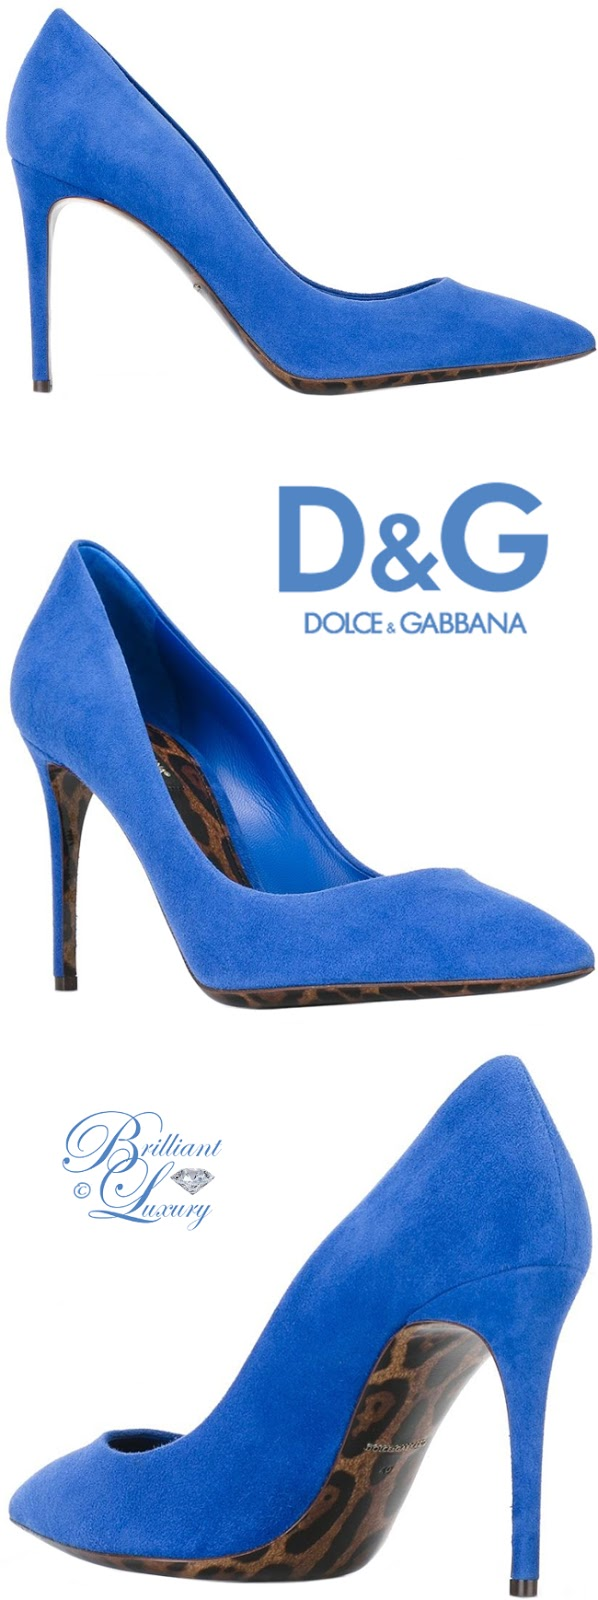 Brilliant Luxury ♦ Dolce & Gabbana Belucci Pumps